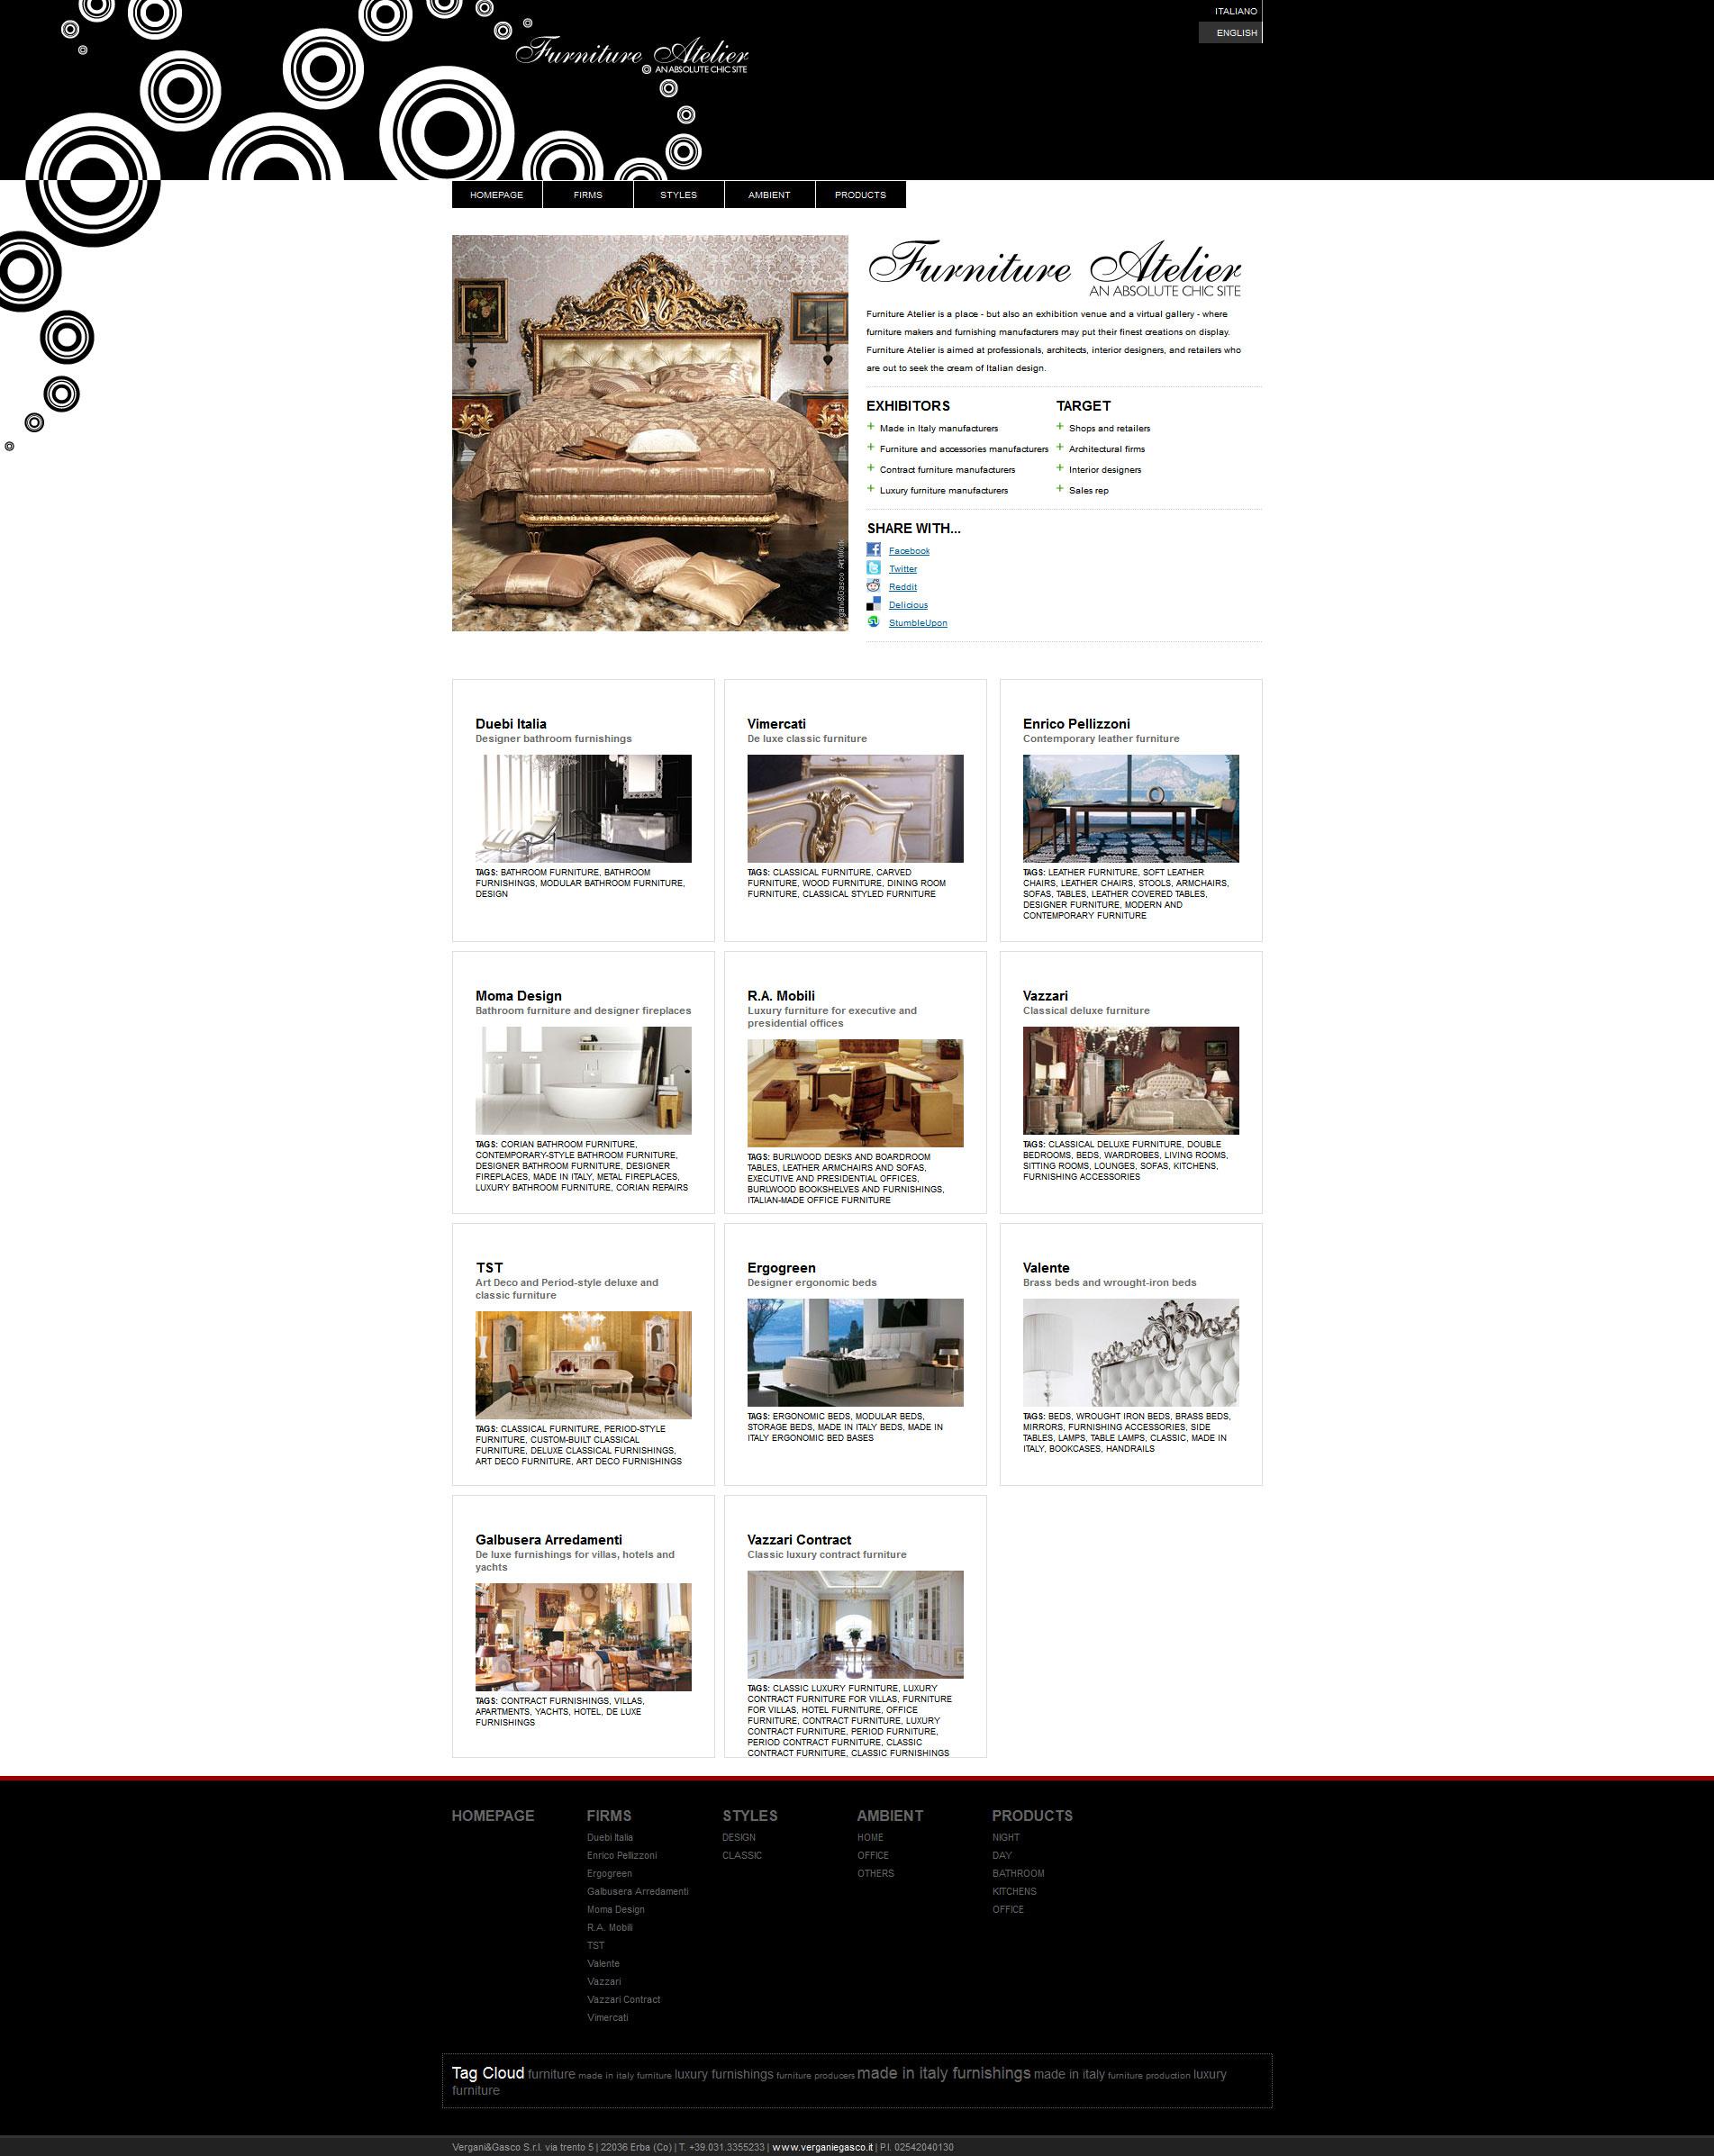 Furniture atelier vergani gasco interactive web agency for Vergani home arredamento